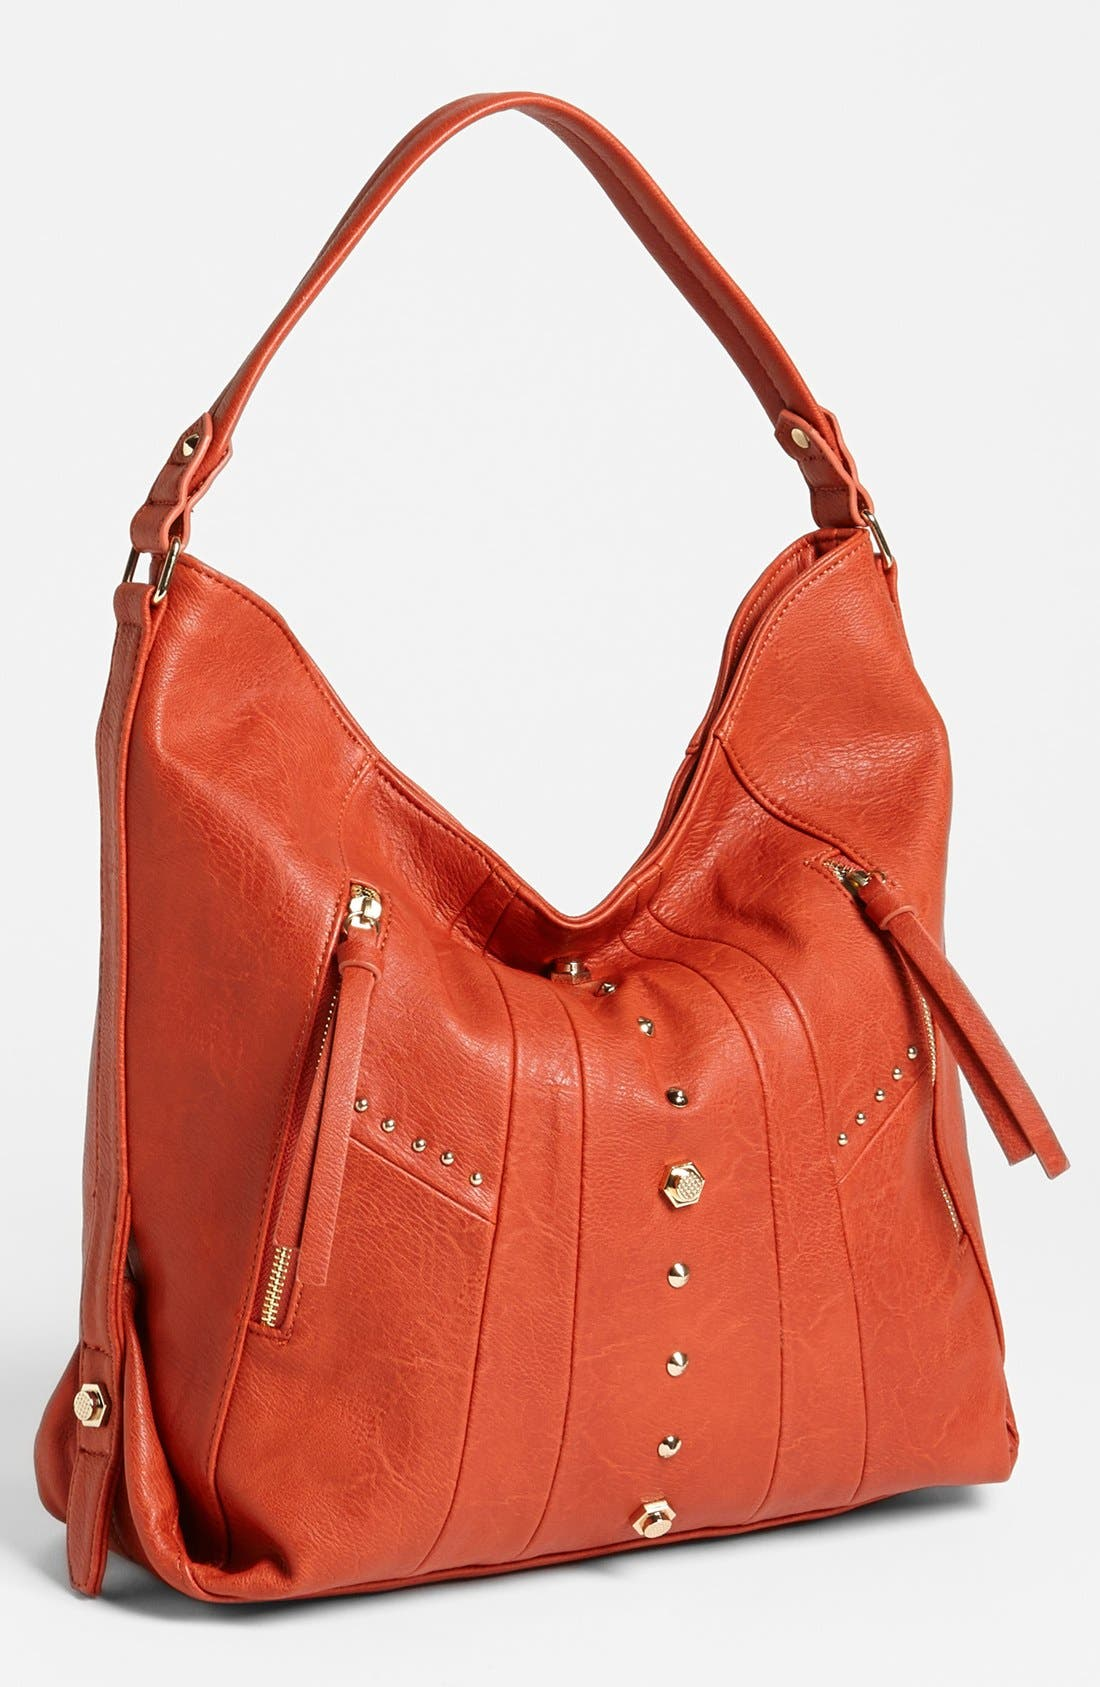 Alternate Image 1 Selected - Danielle Nicole 'Collette' Hobo Bag